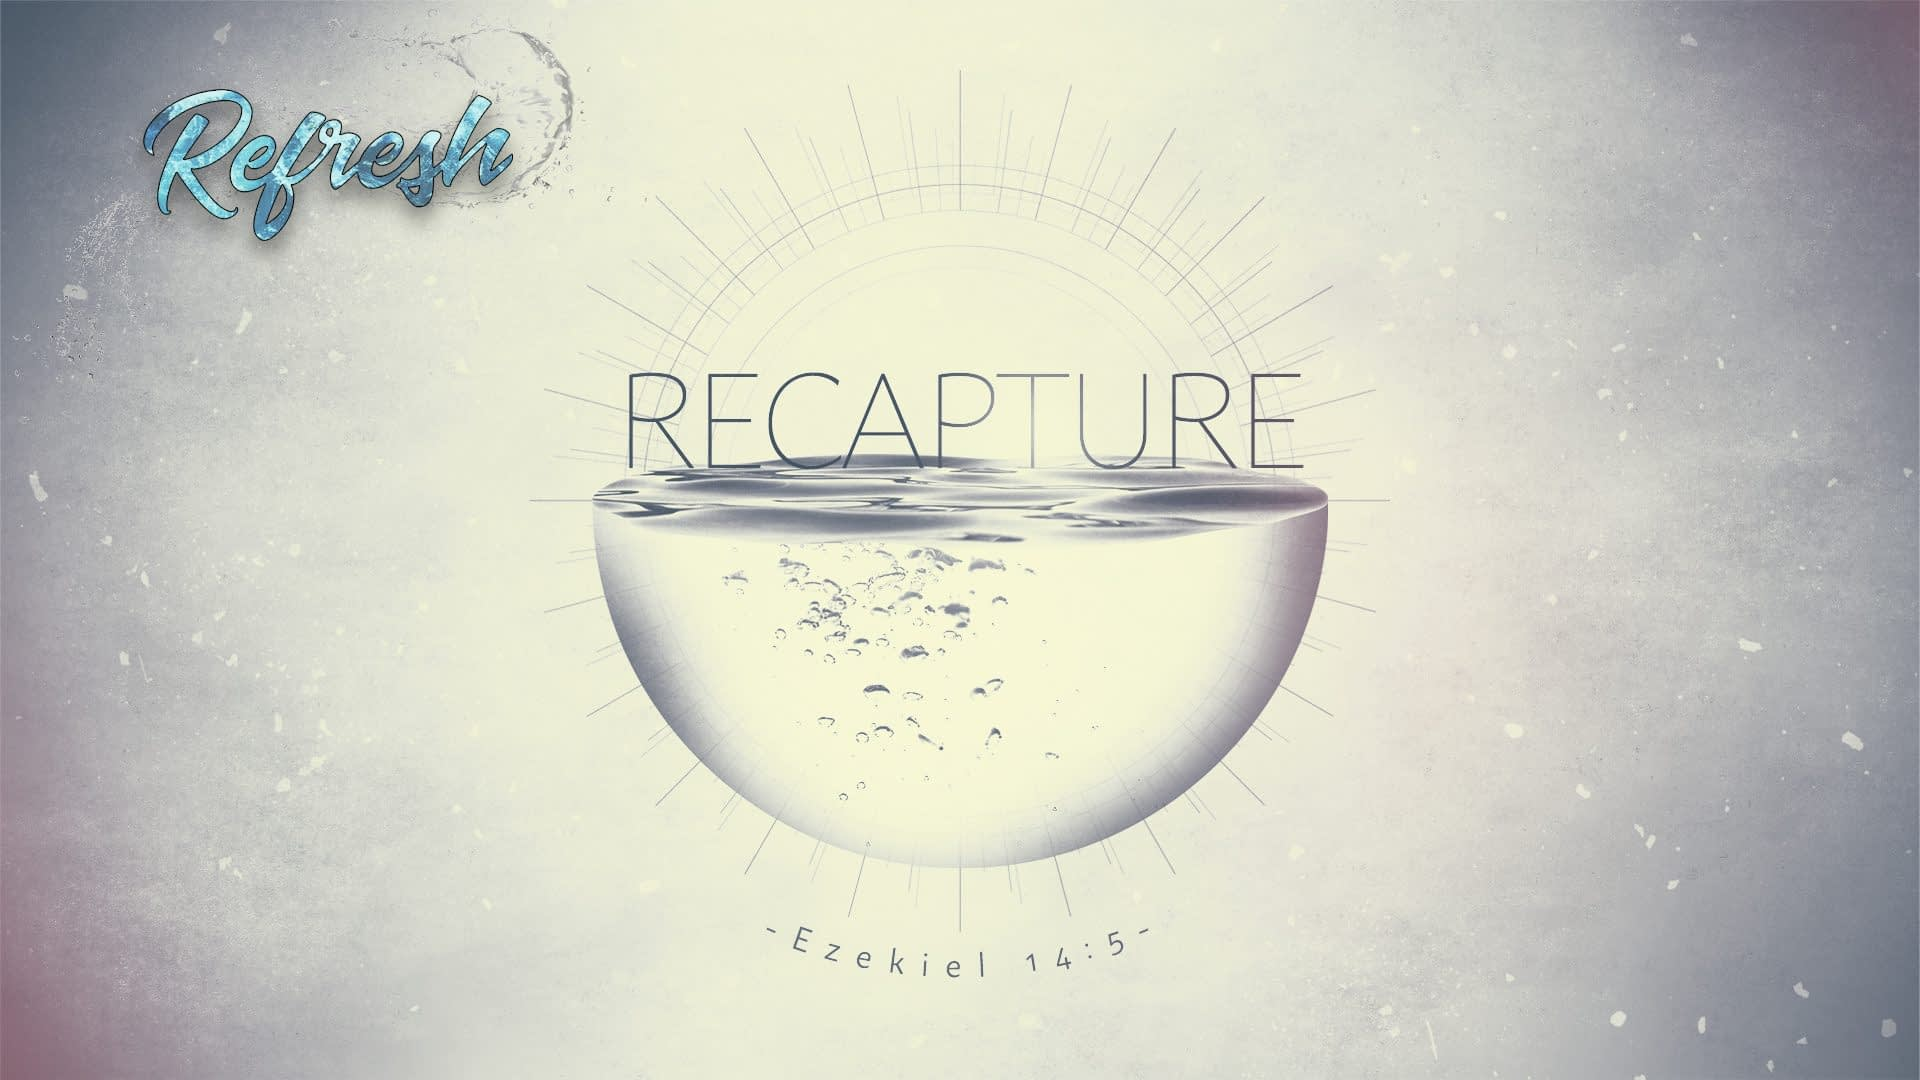 Recapture1920